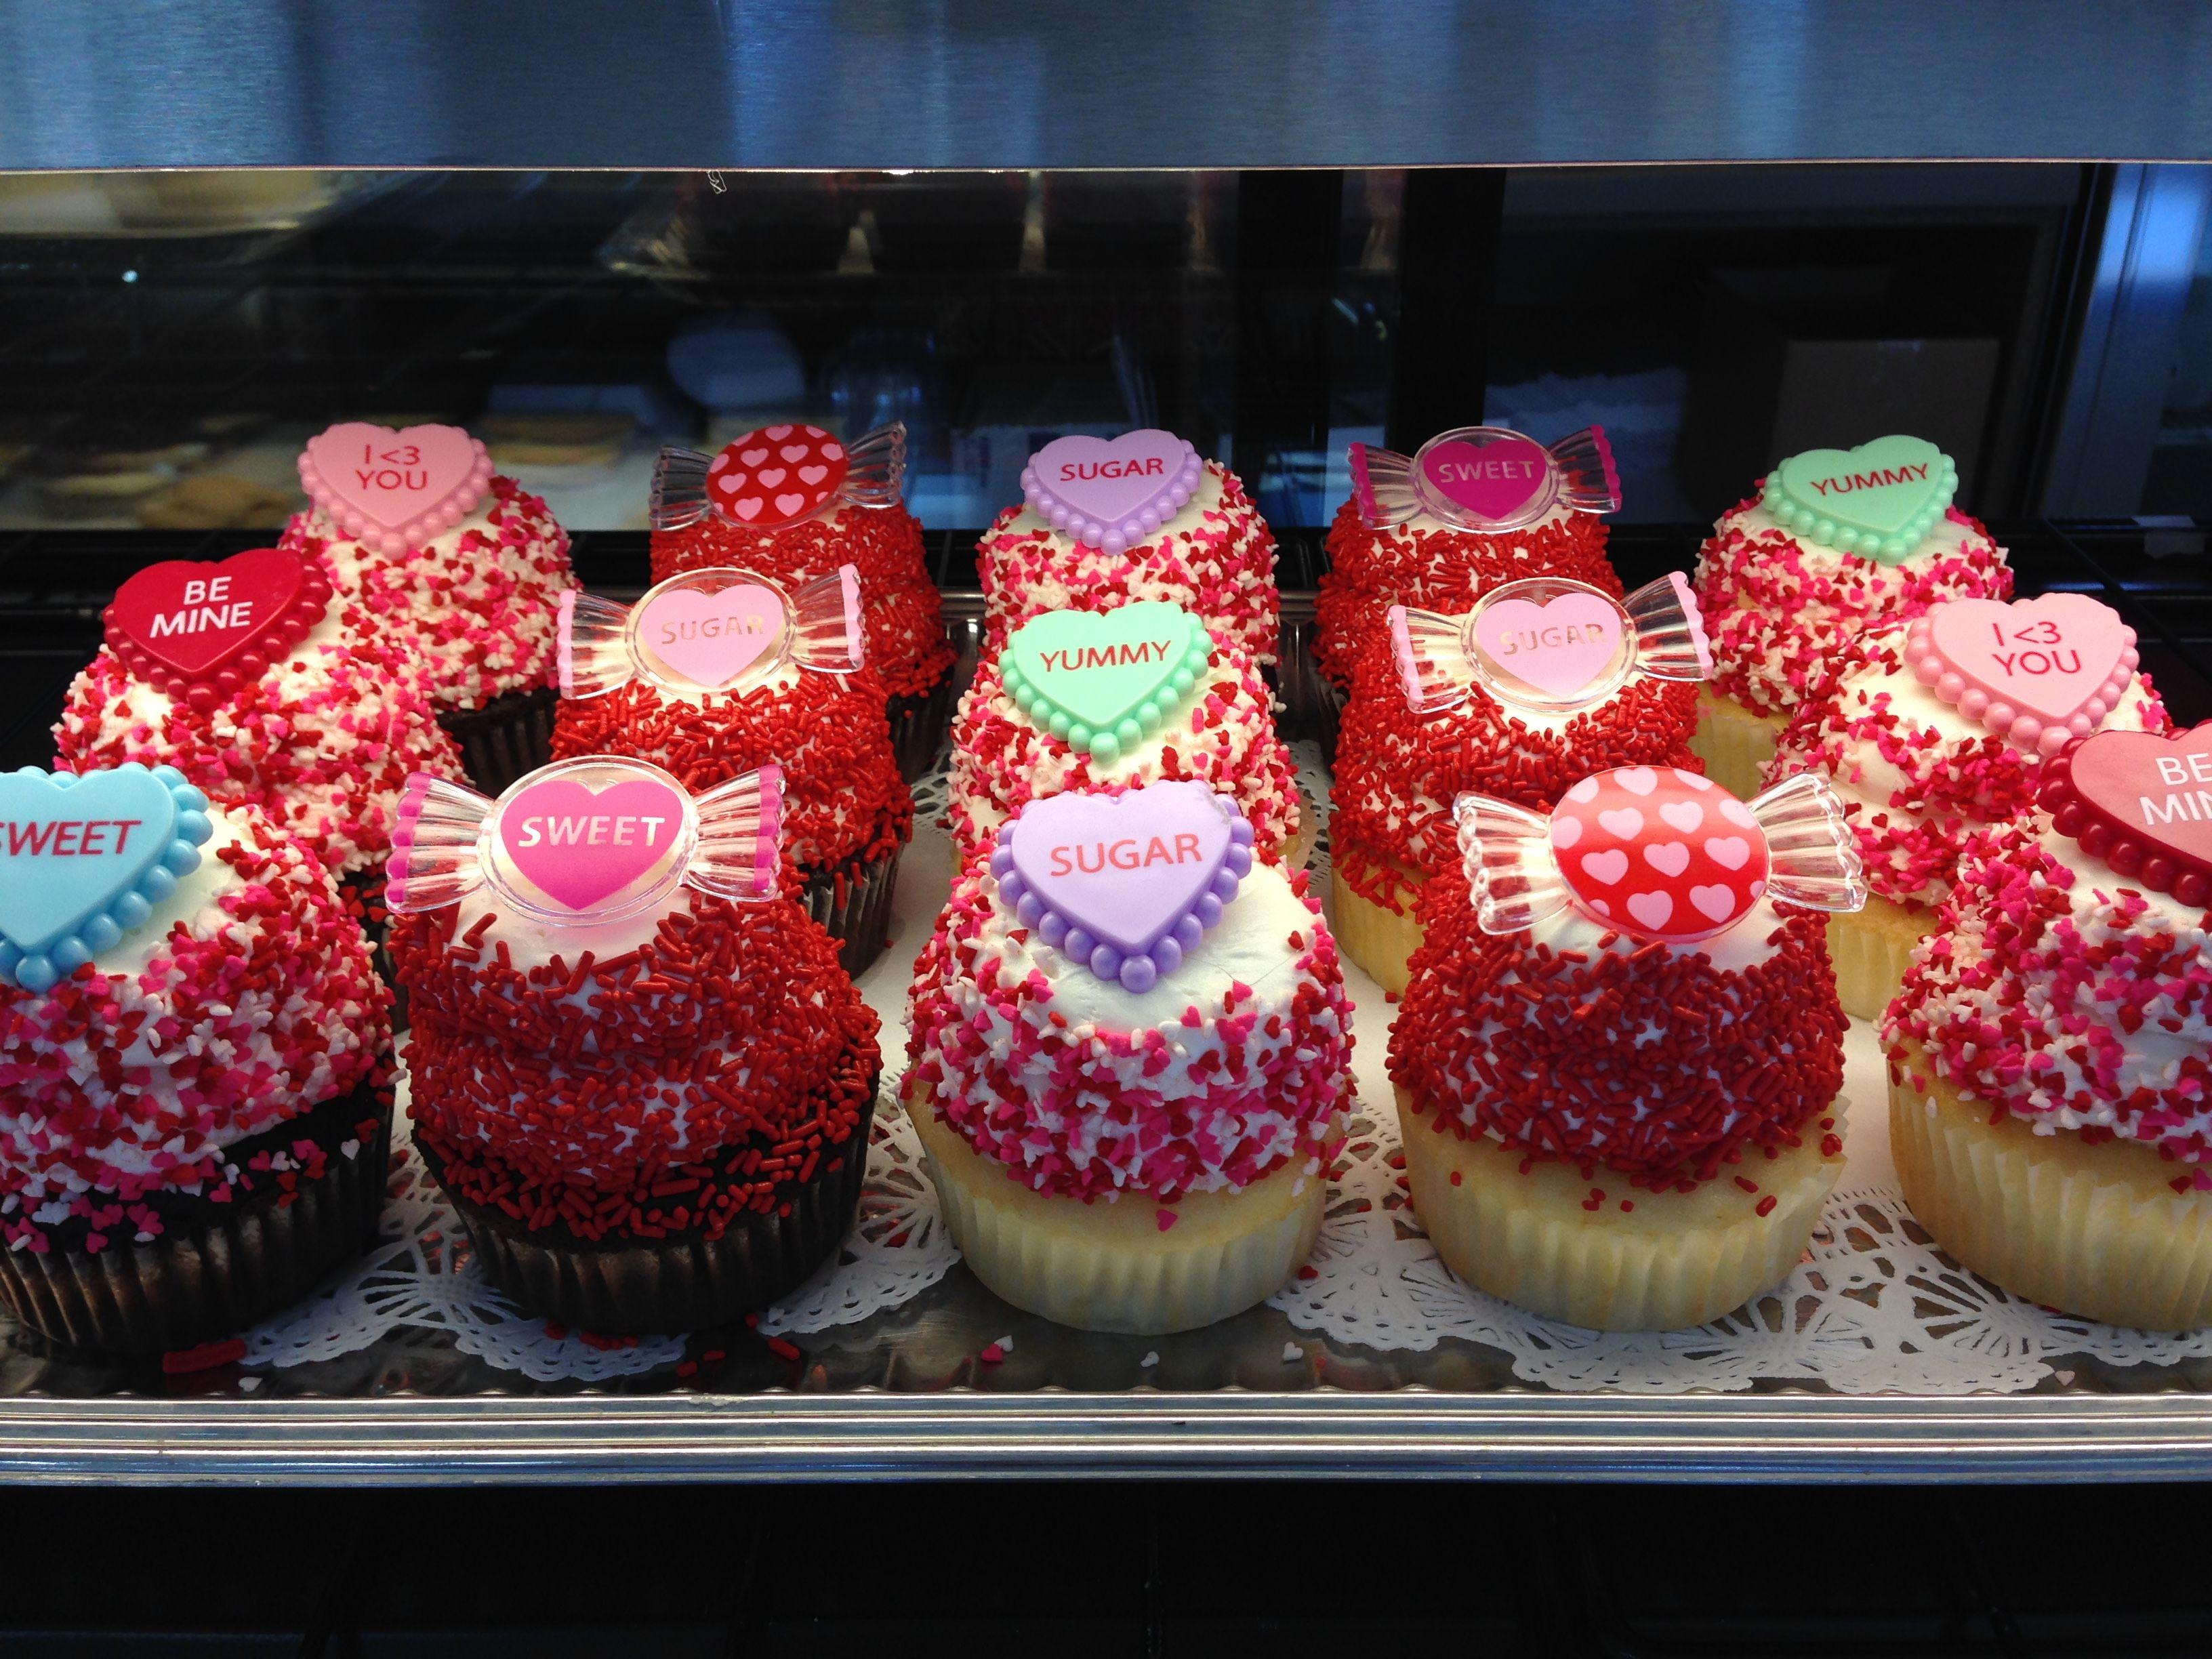 Loving Valentine S Day Puffy Muffin Dessert Bakery And Restaurant Www Puffymuffin Com Best Bakery Puffy Muffin Bakery